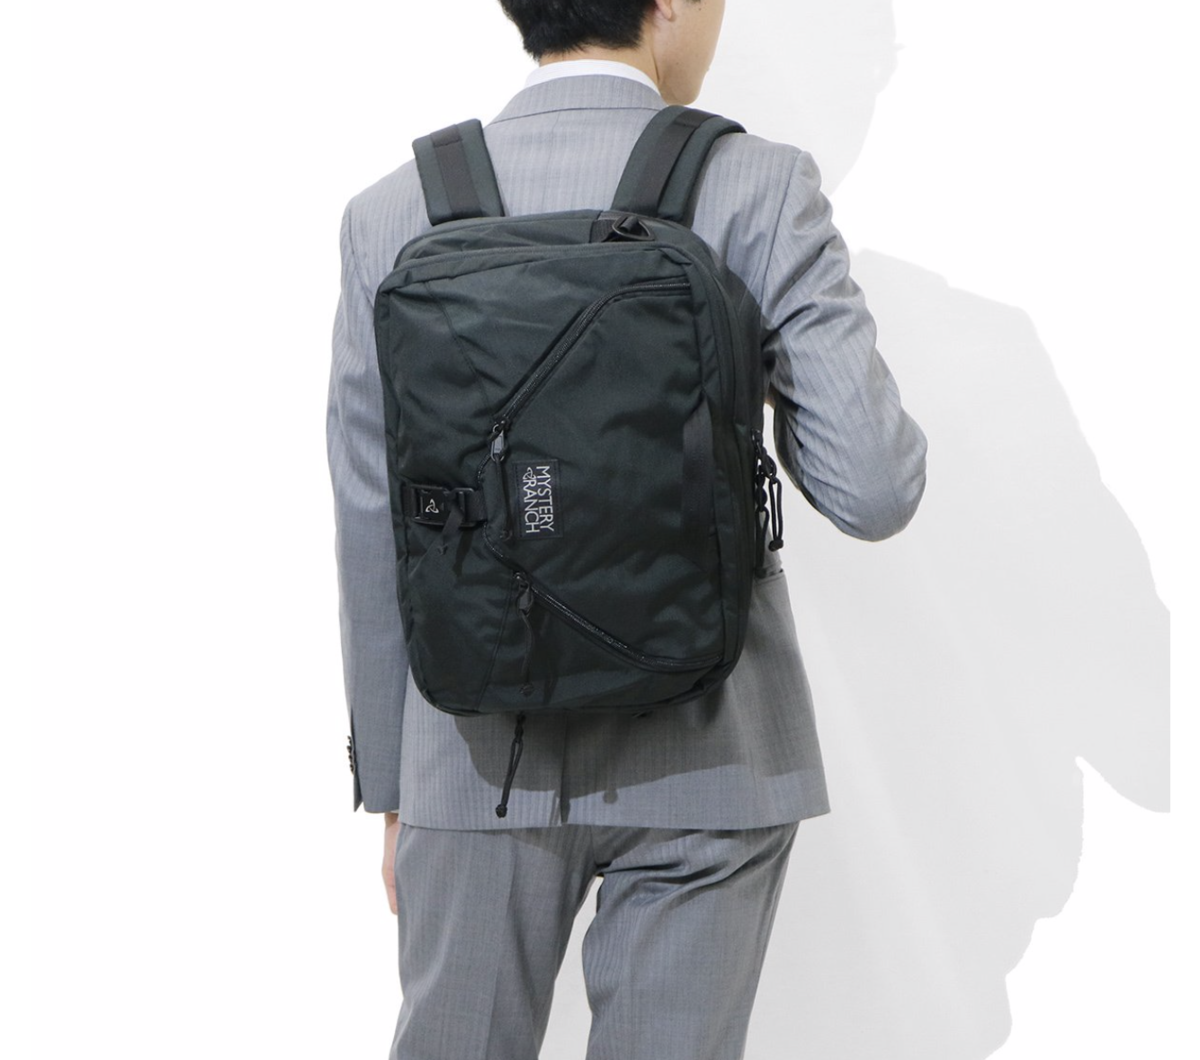 f:id:thebackpack:20190313230033p:plain